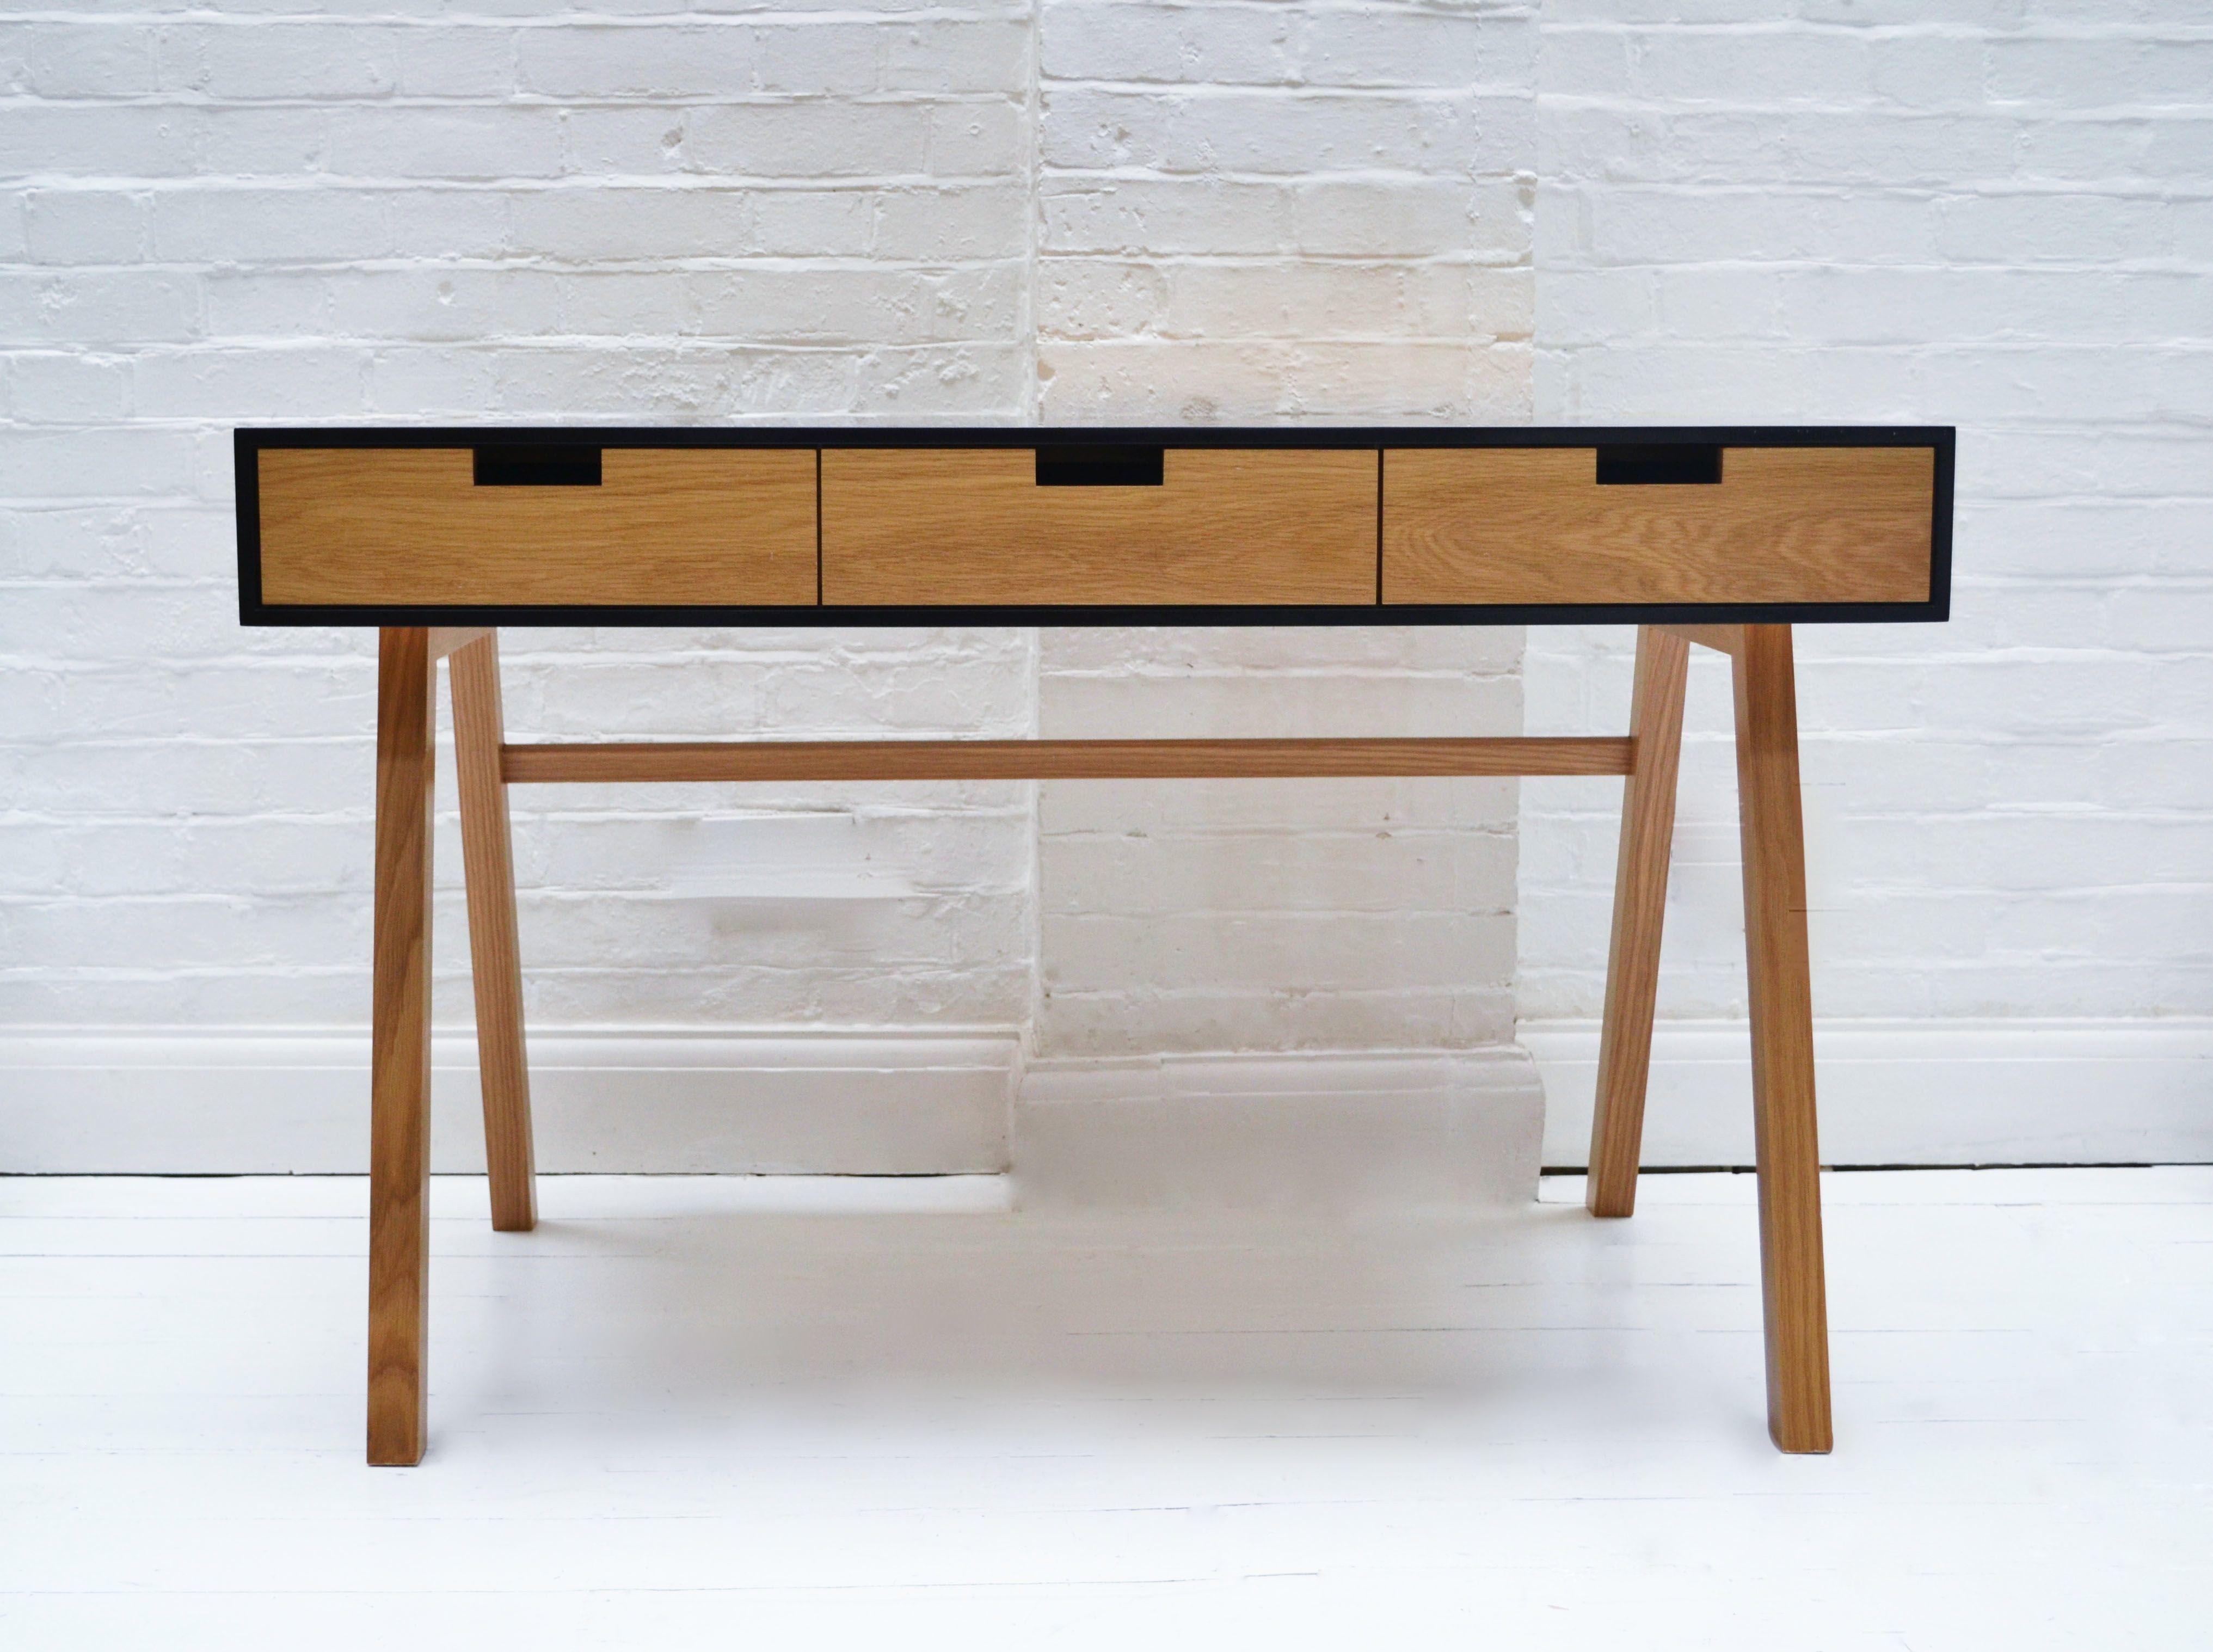 london solid oak 5. Black Corian Solid Oak Writing Desk Design By Nico. Tent London, Stand F14 Hall London 5